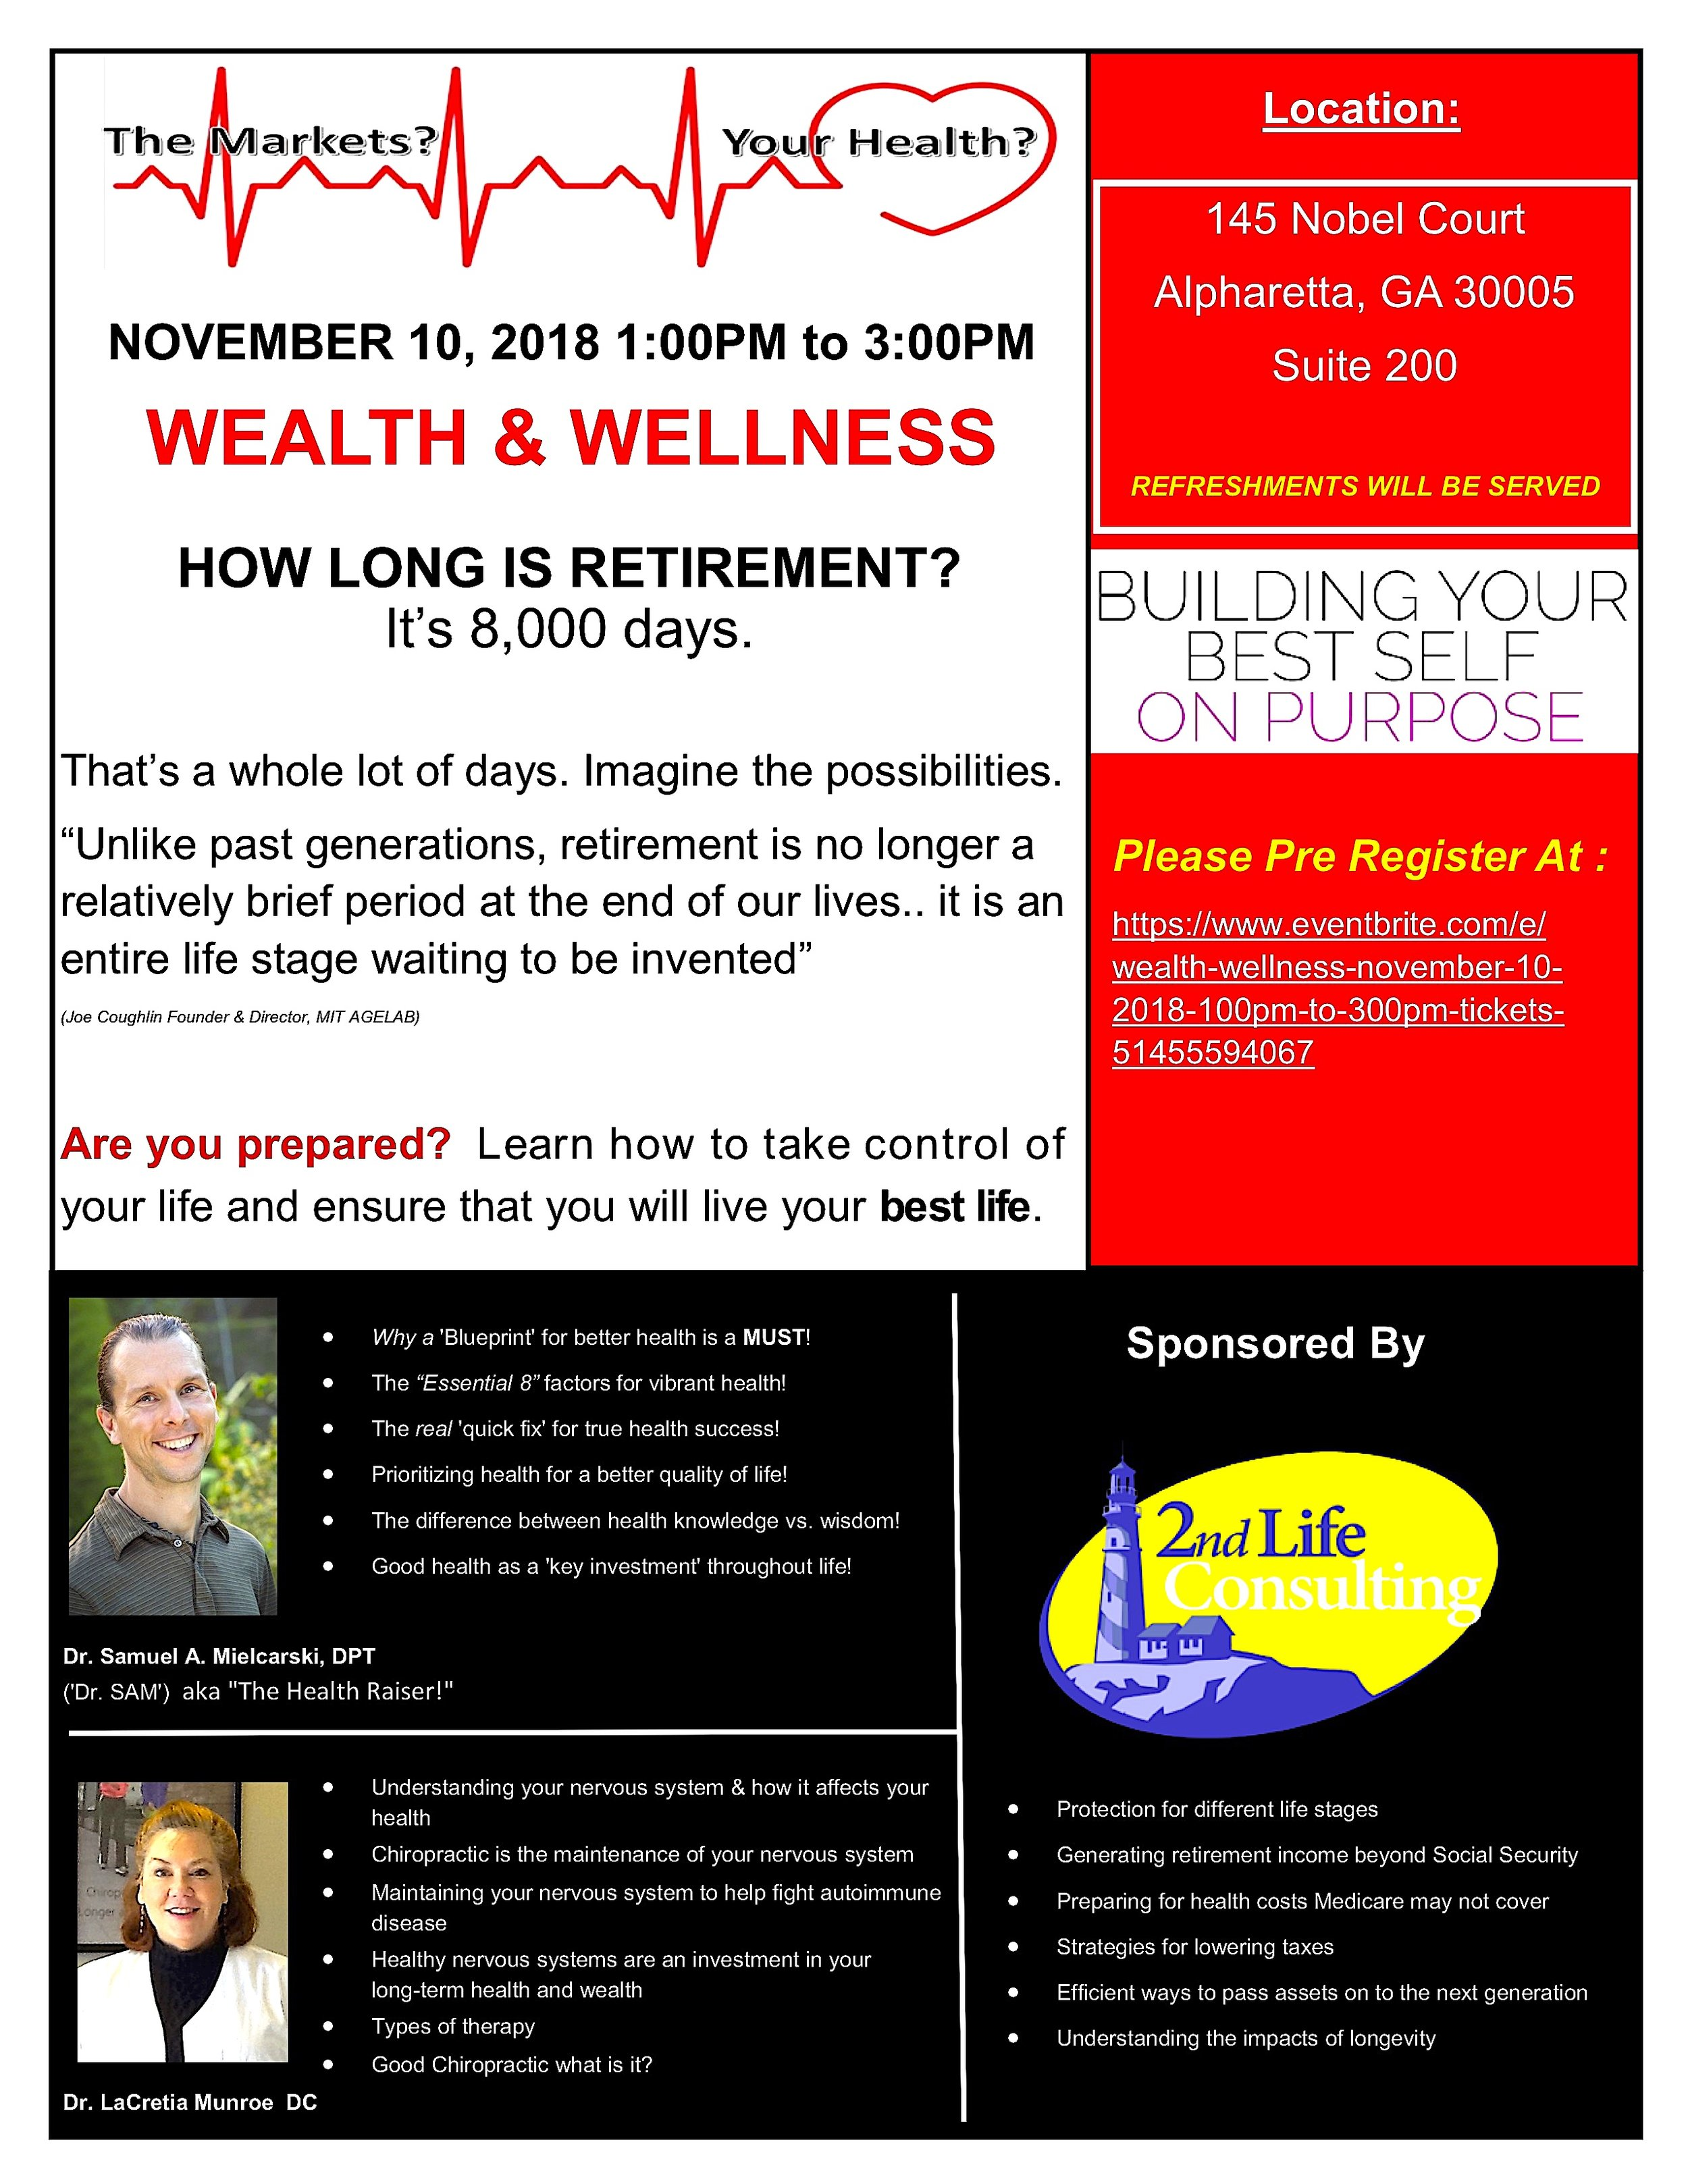 Wealth & Wellness Event With Dr. SAM.jpg